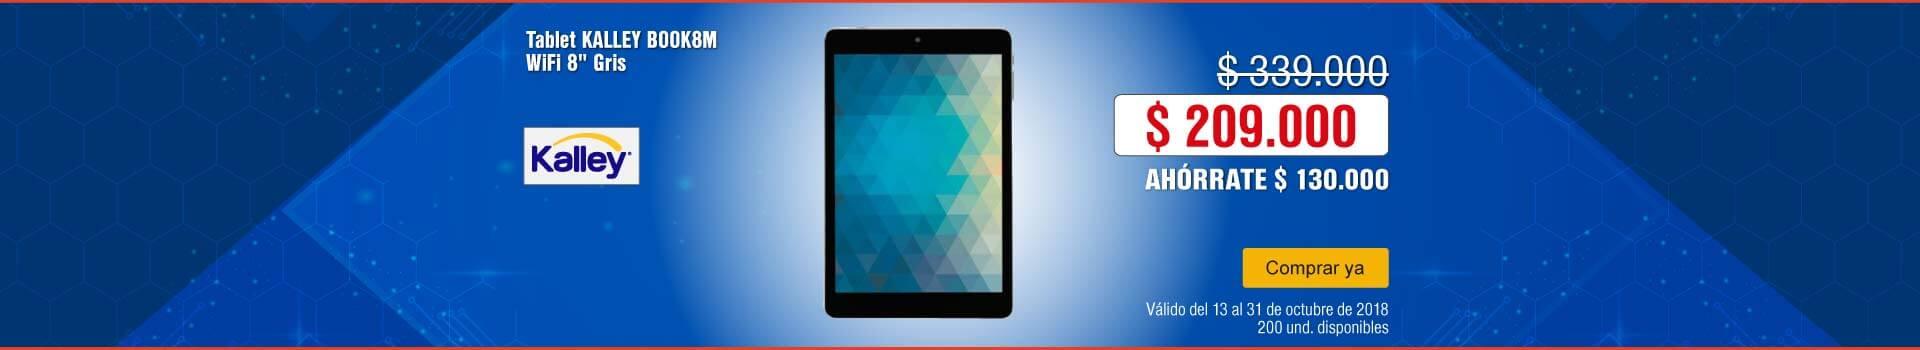 AK-BCAT-1-computadores y tablets-tablet-PP---Kalley-Tablet BOOK8M gris-Oct13